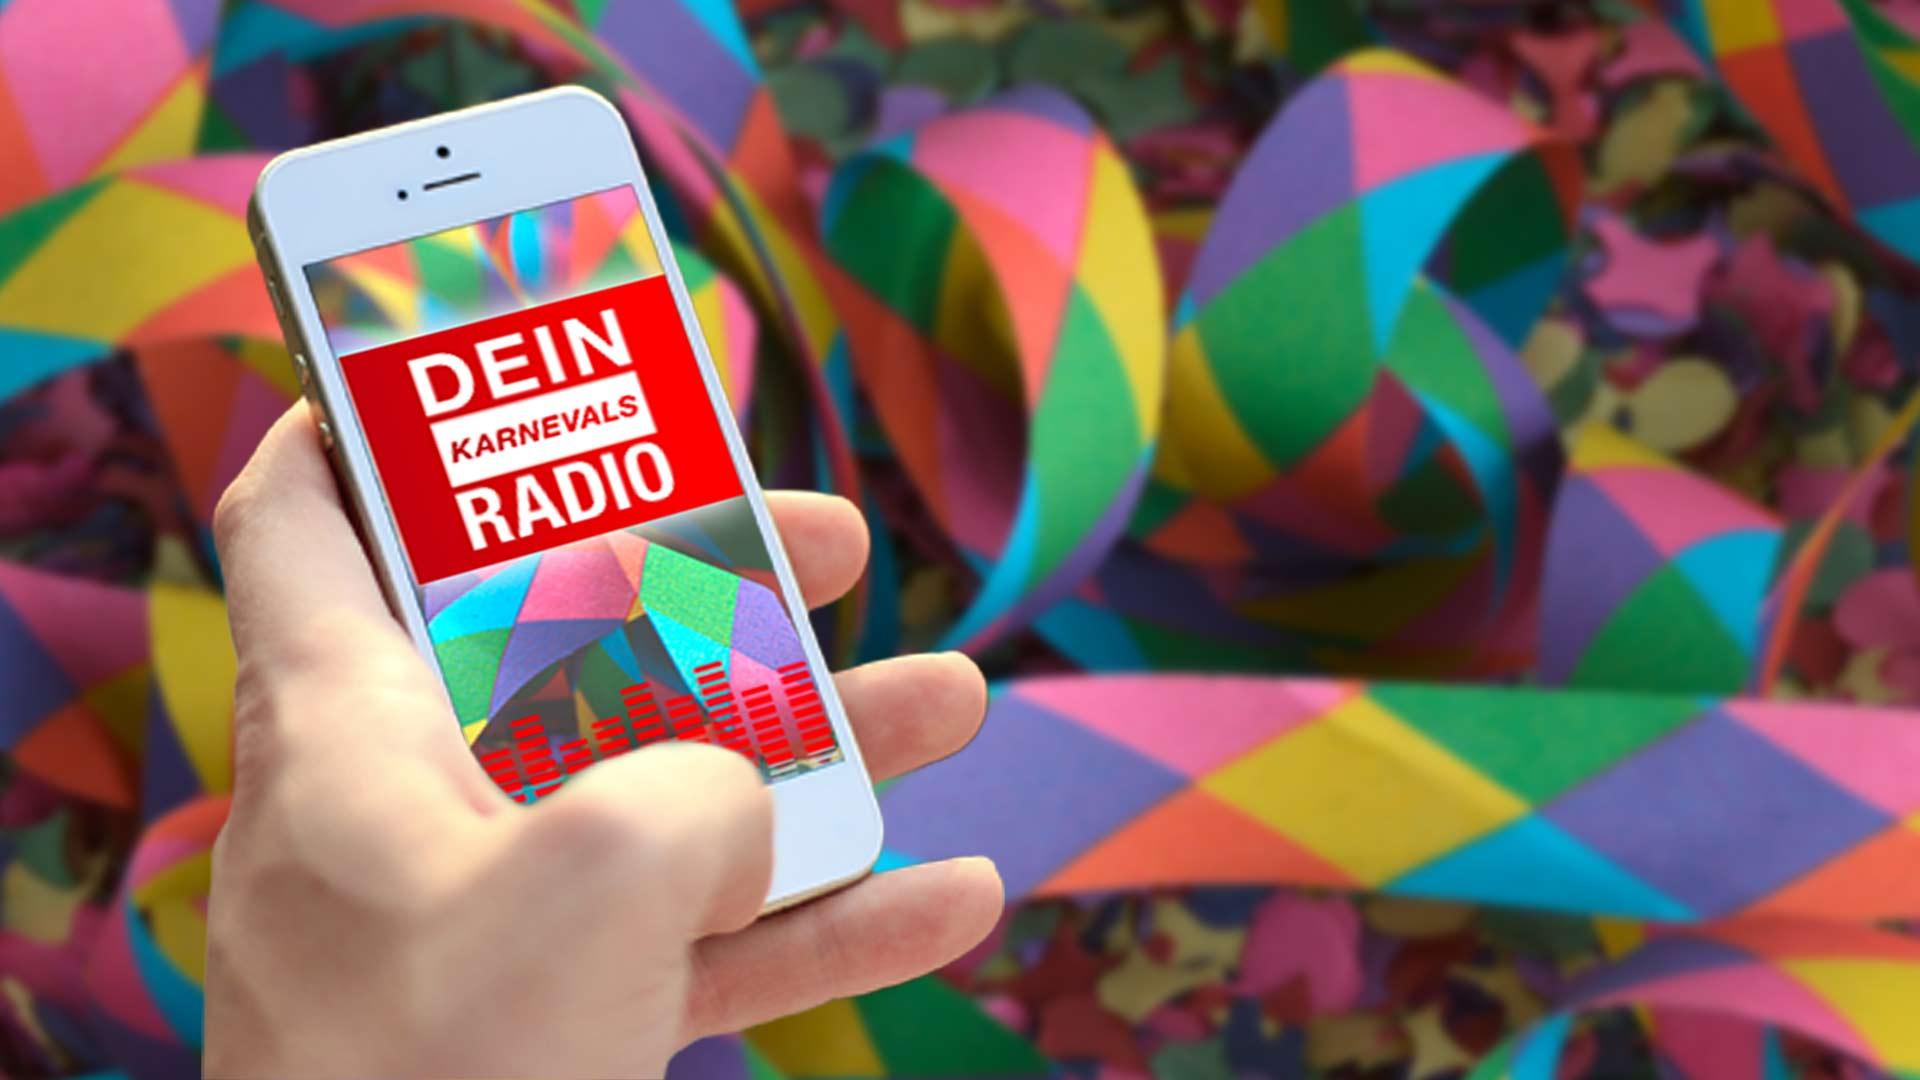 Dein Karnevals Radio bietet Karnevalshits nonstop. Foto: Westfunk